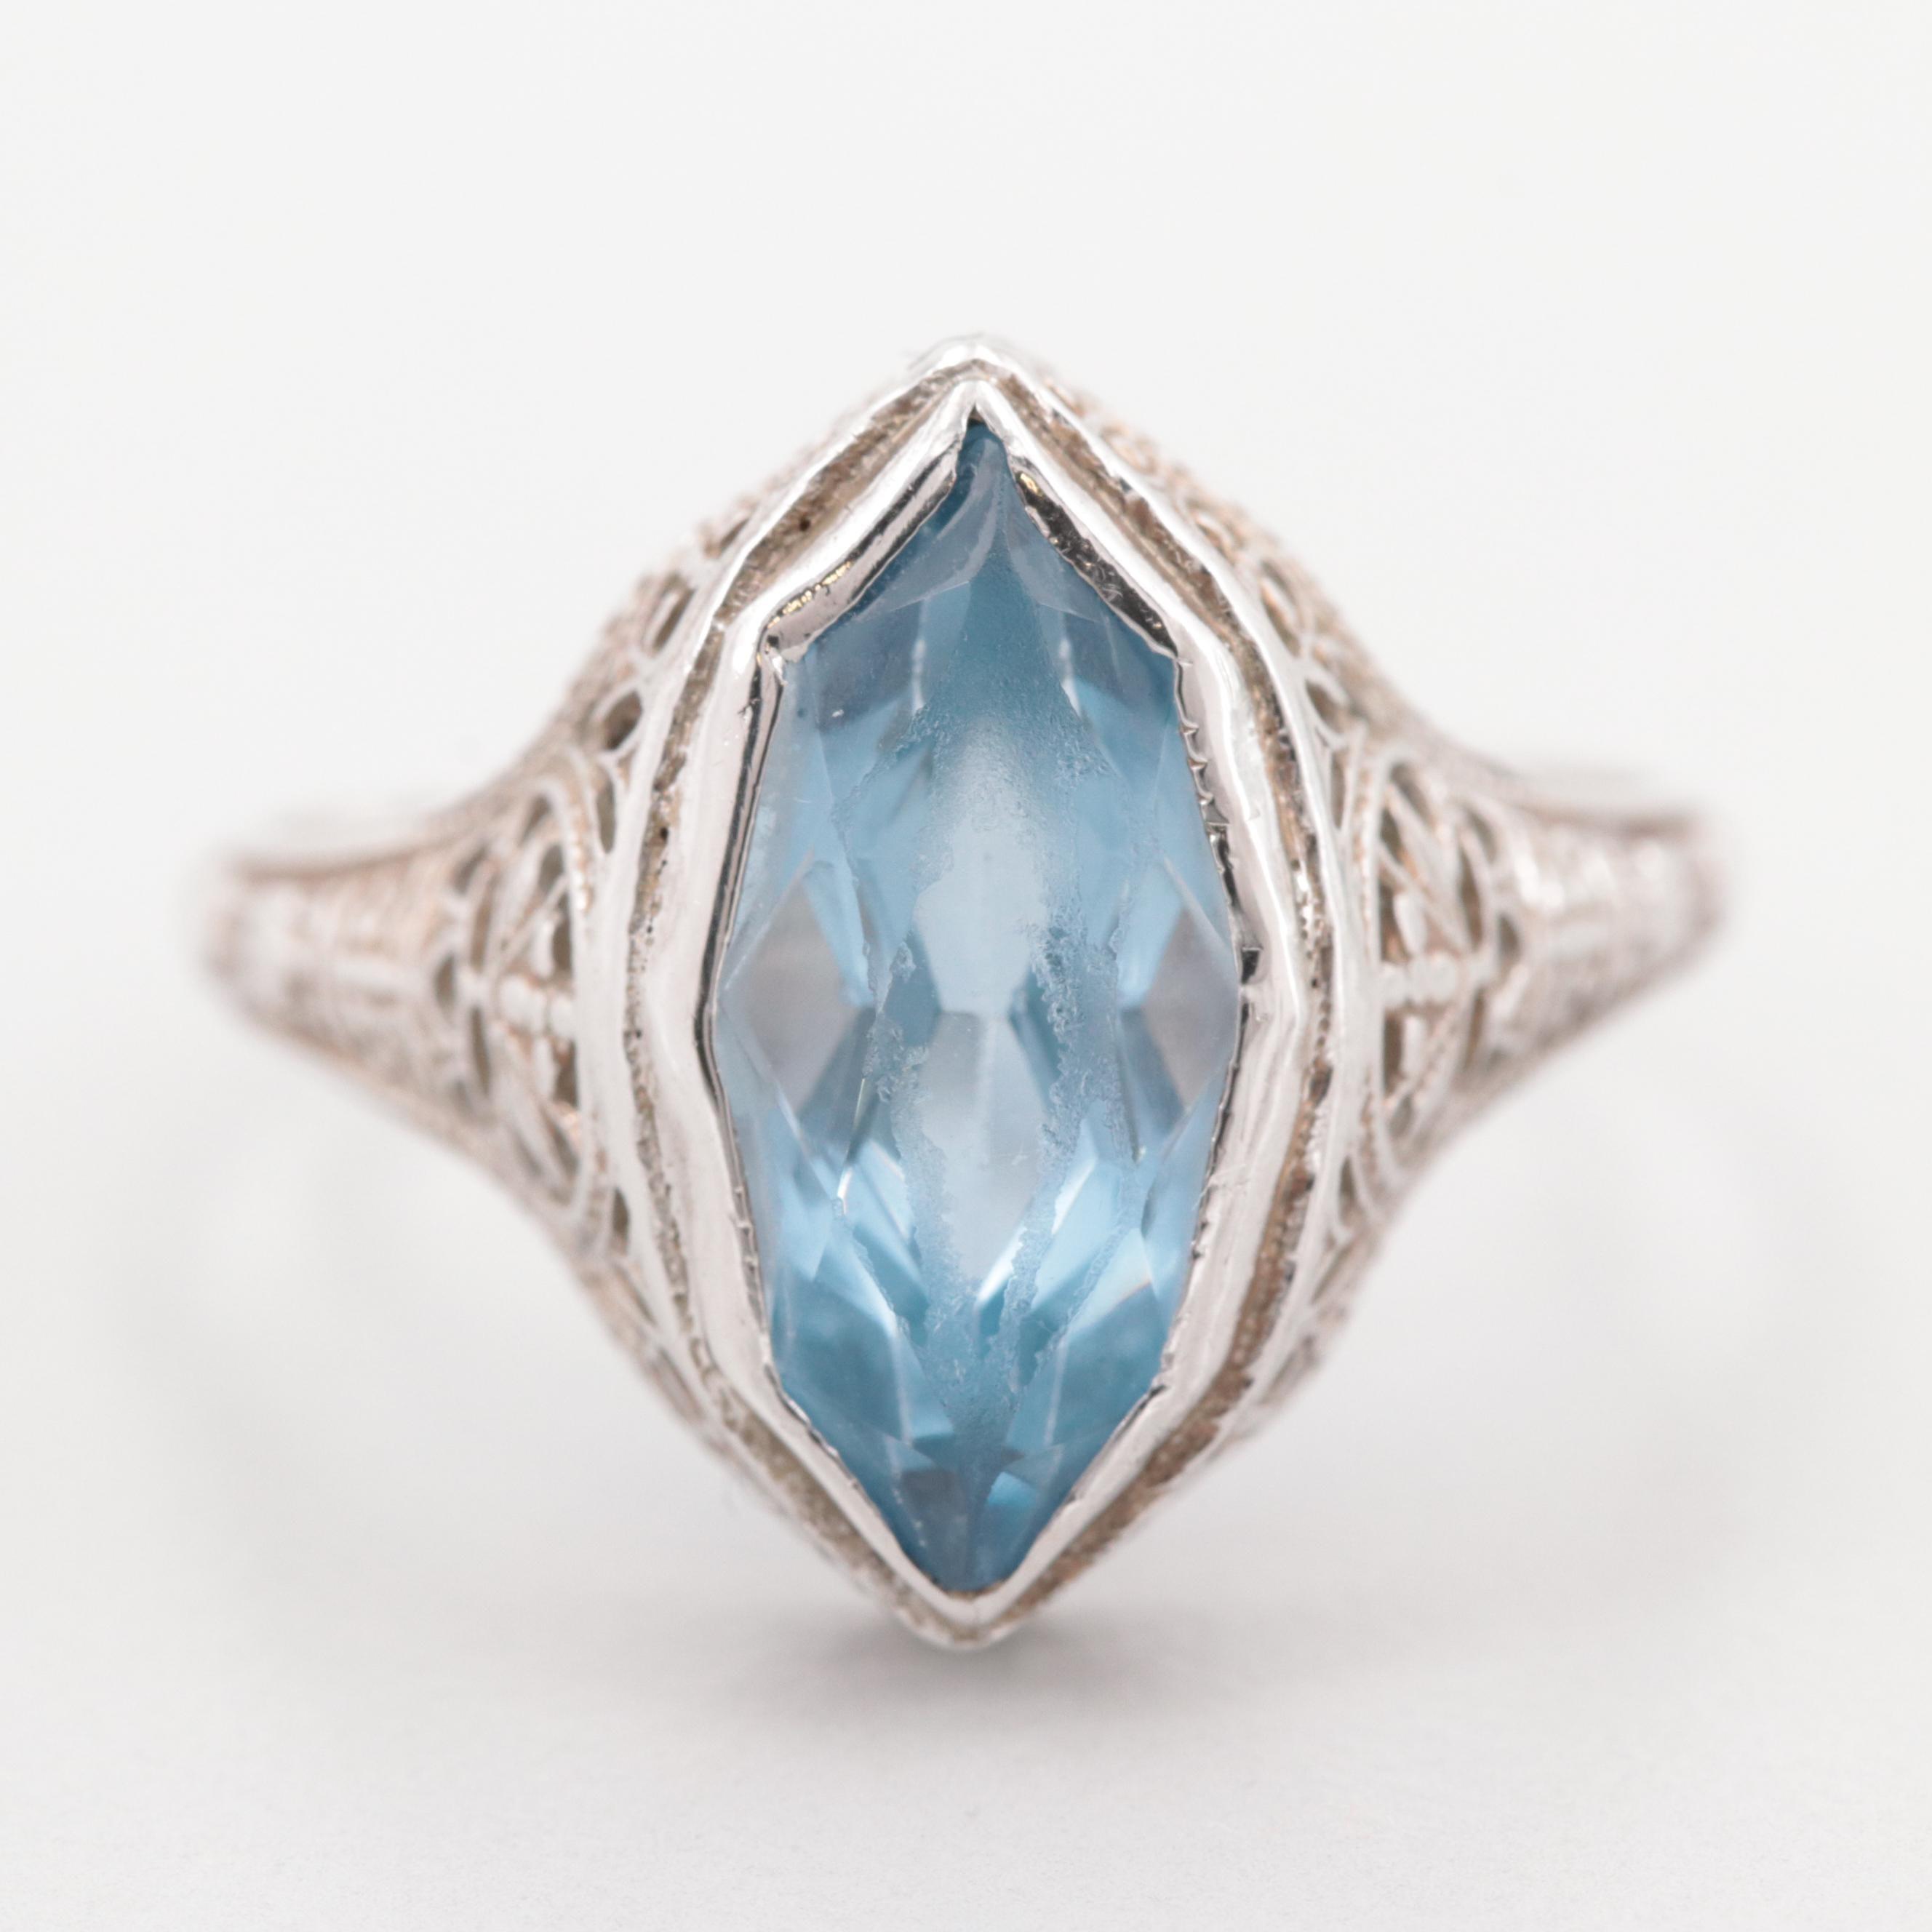 Art Deco 14K White Gold Synthetic Spinel Filigree Ring